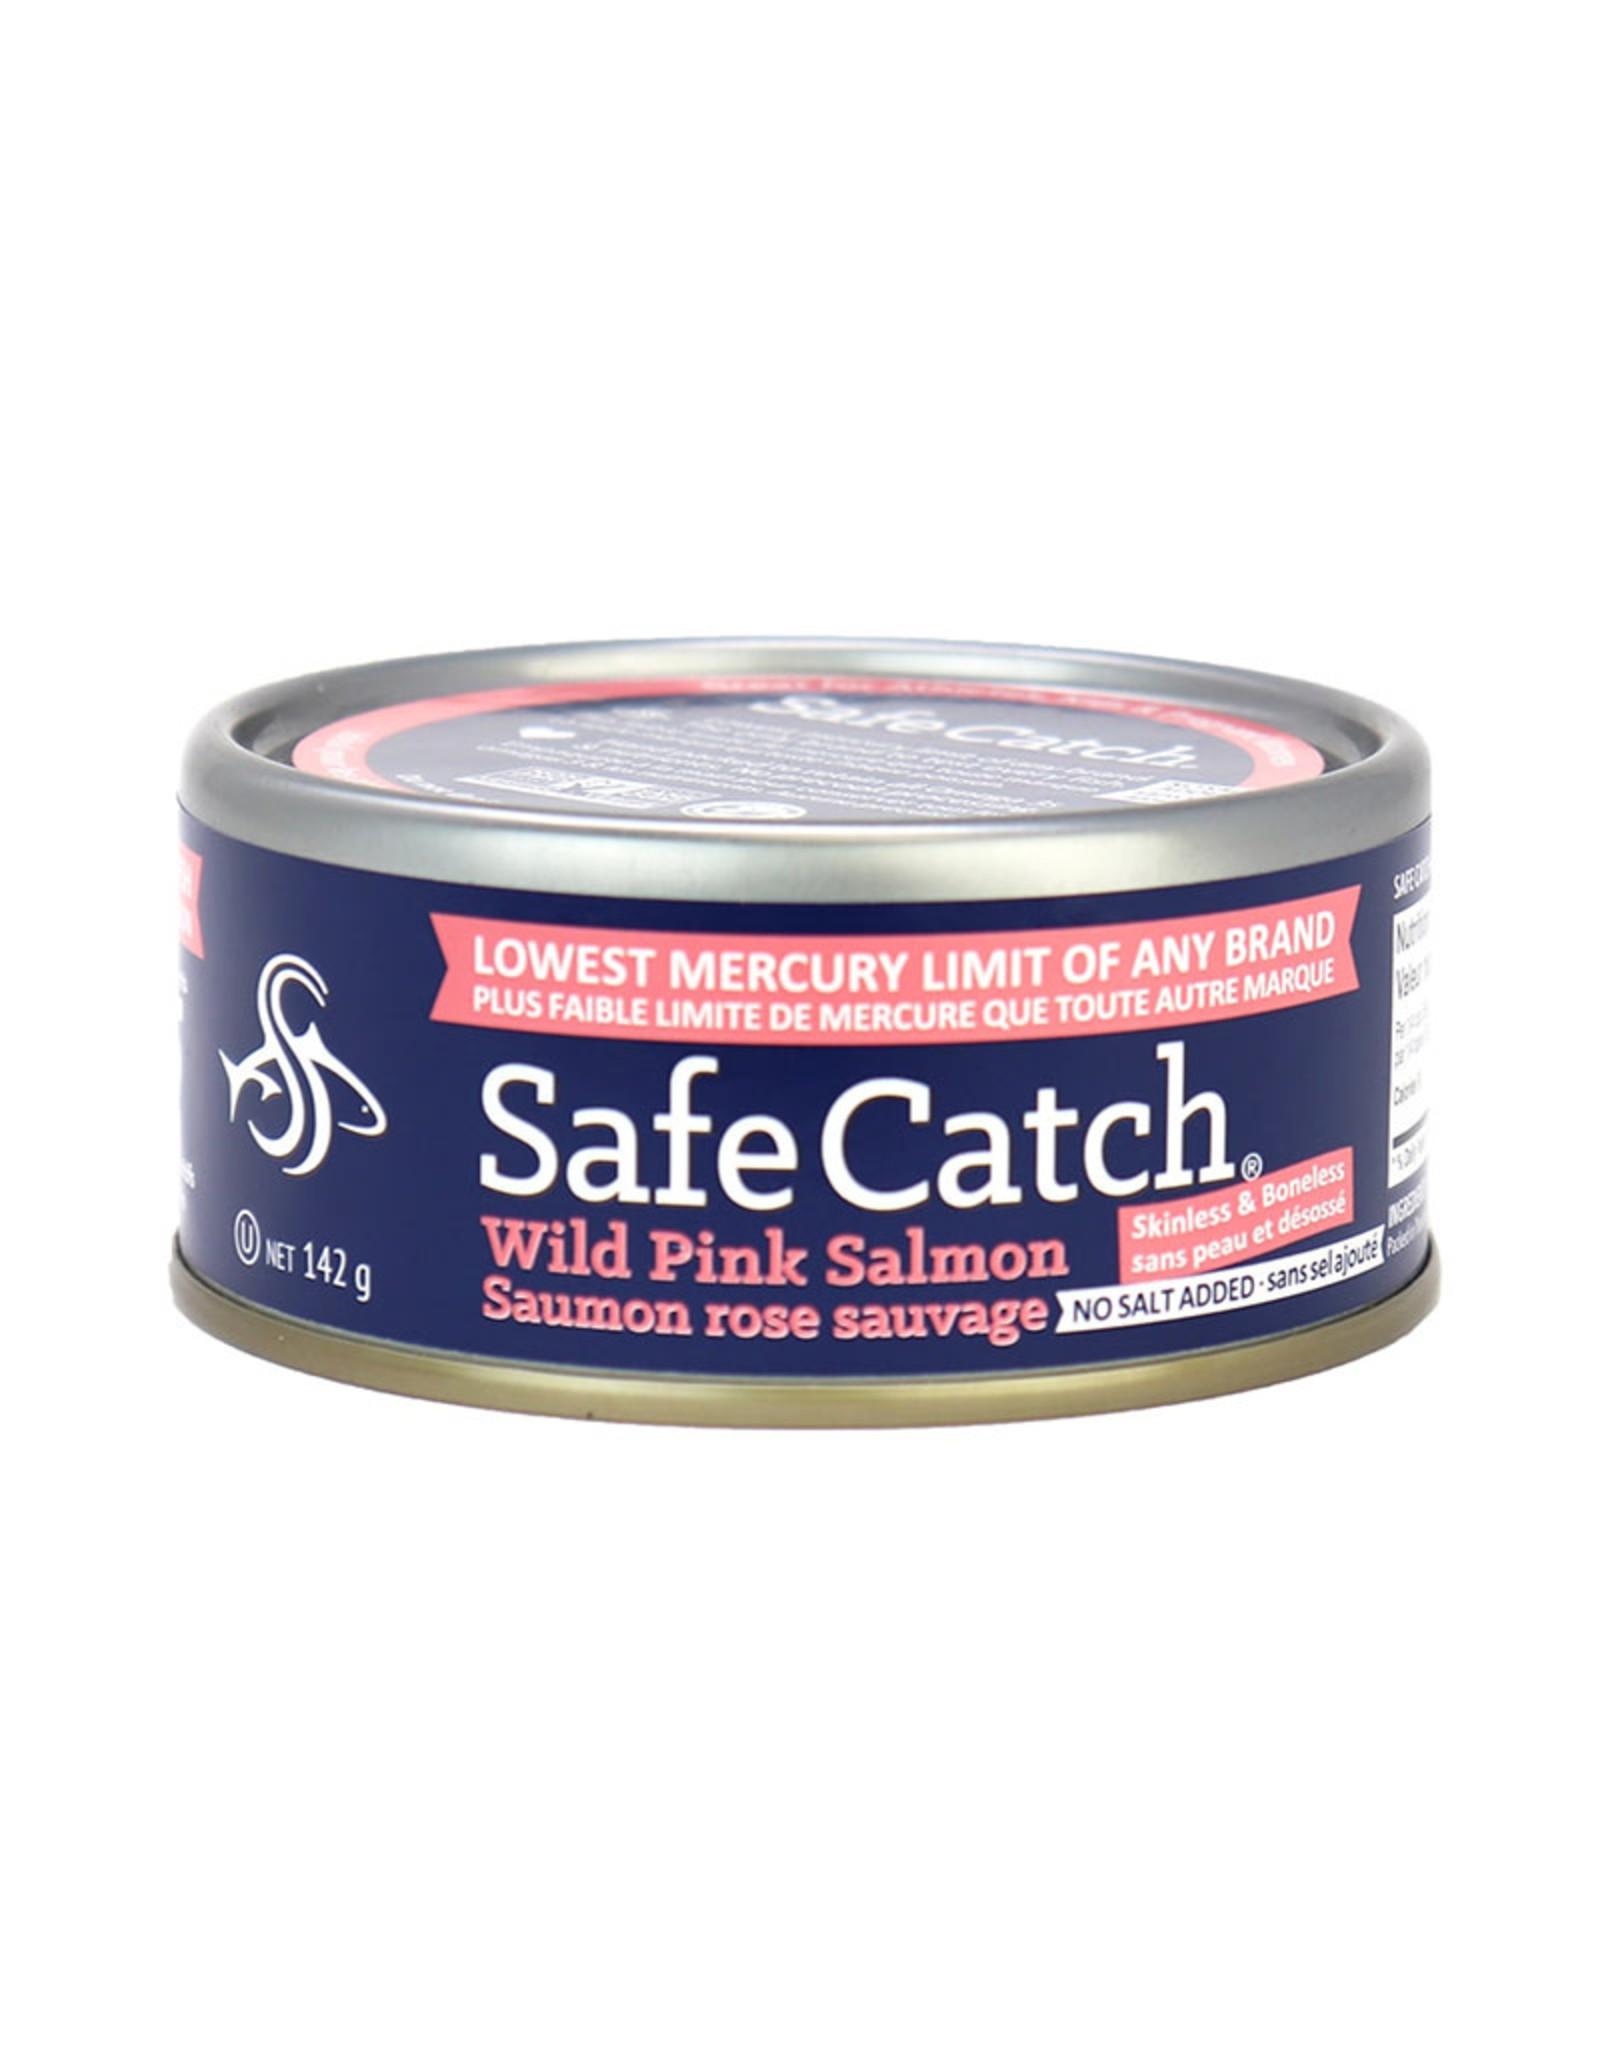 Safe Catch Safe Catch - Wild Pink Salmon, No Salt (142g)